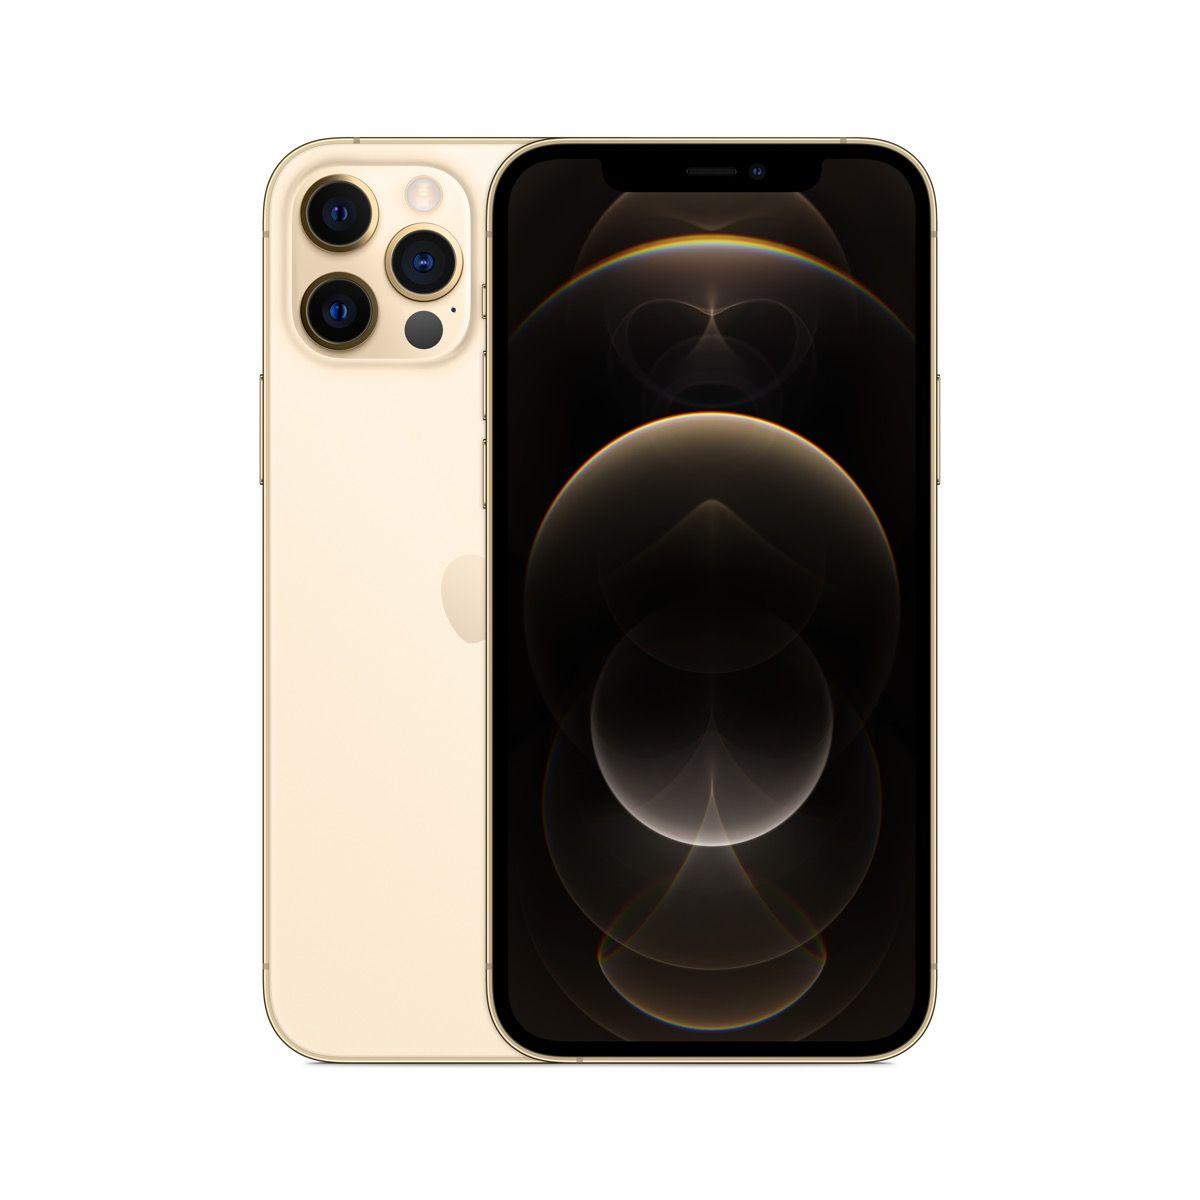 Apple iPhone 12 Pro Max 256GB Gold / SK